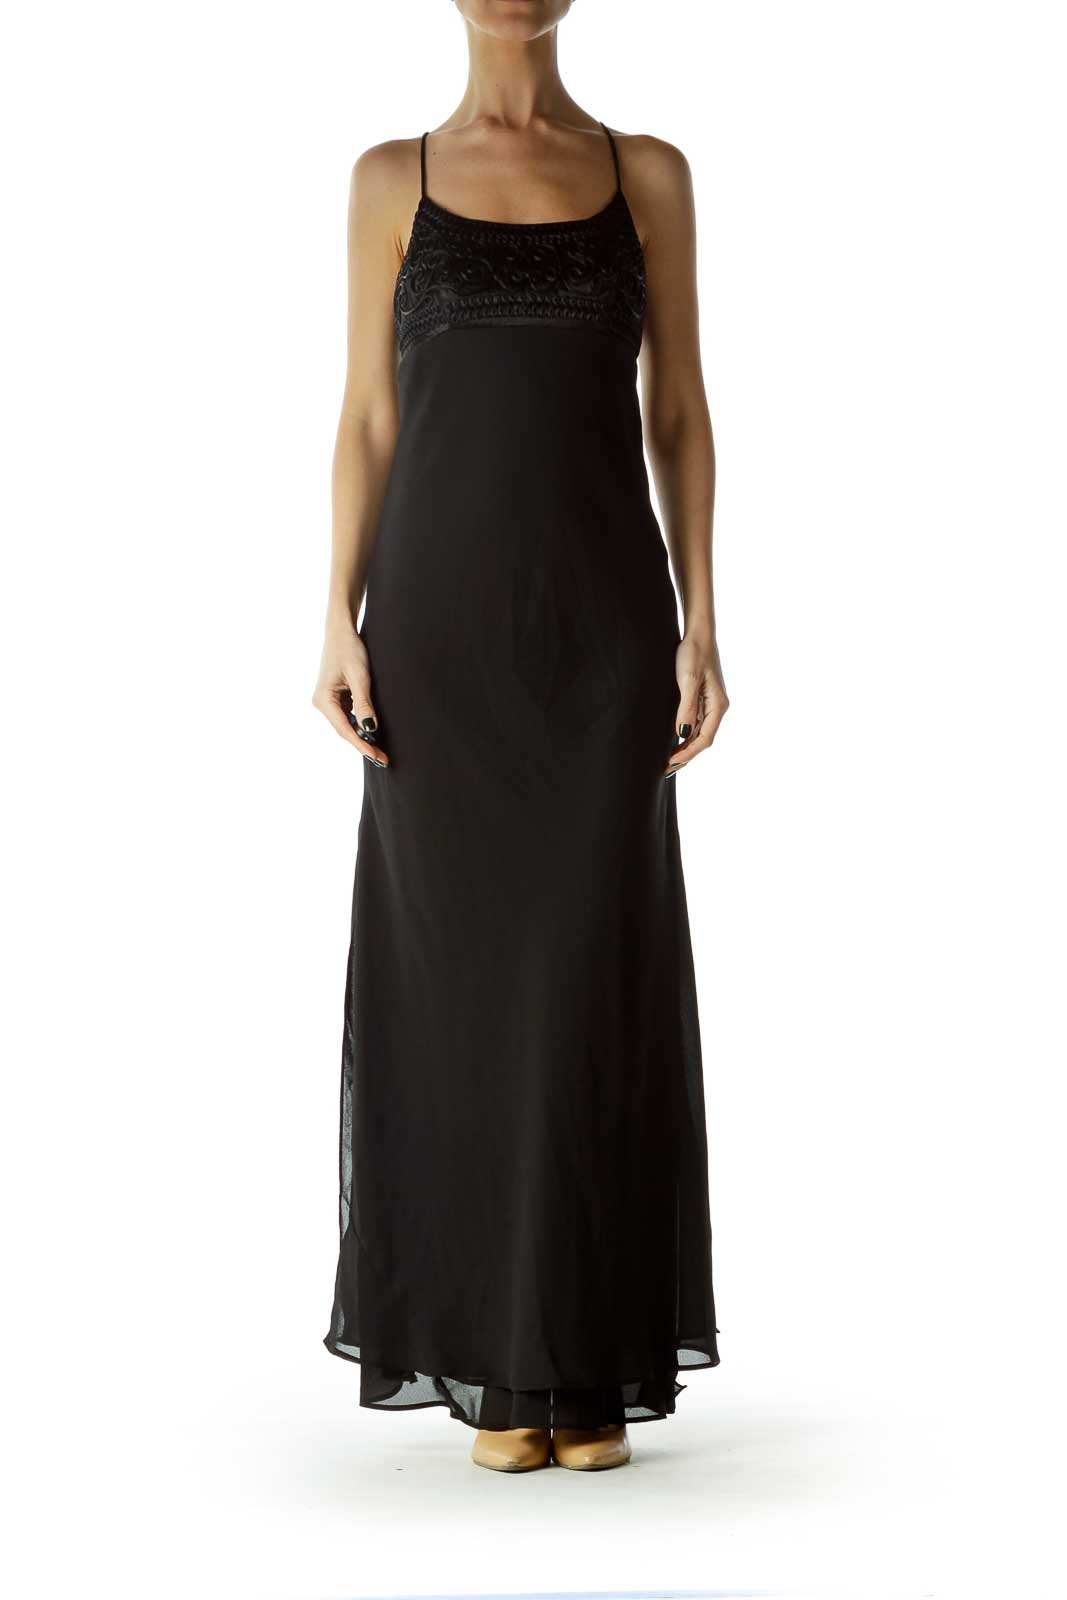 Black Spaghetti Strap Empire Waist Evening Dress Front